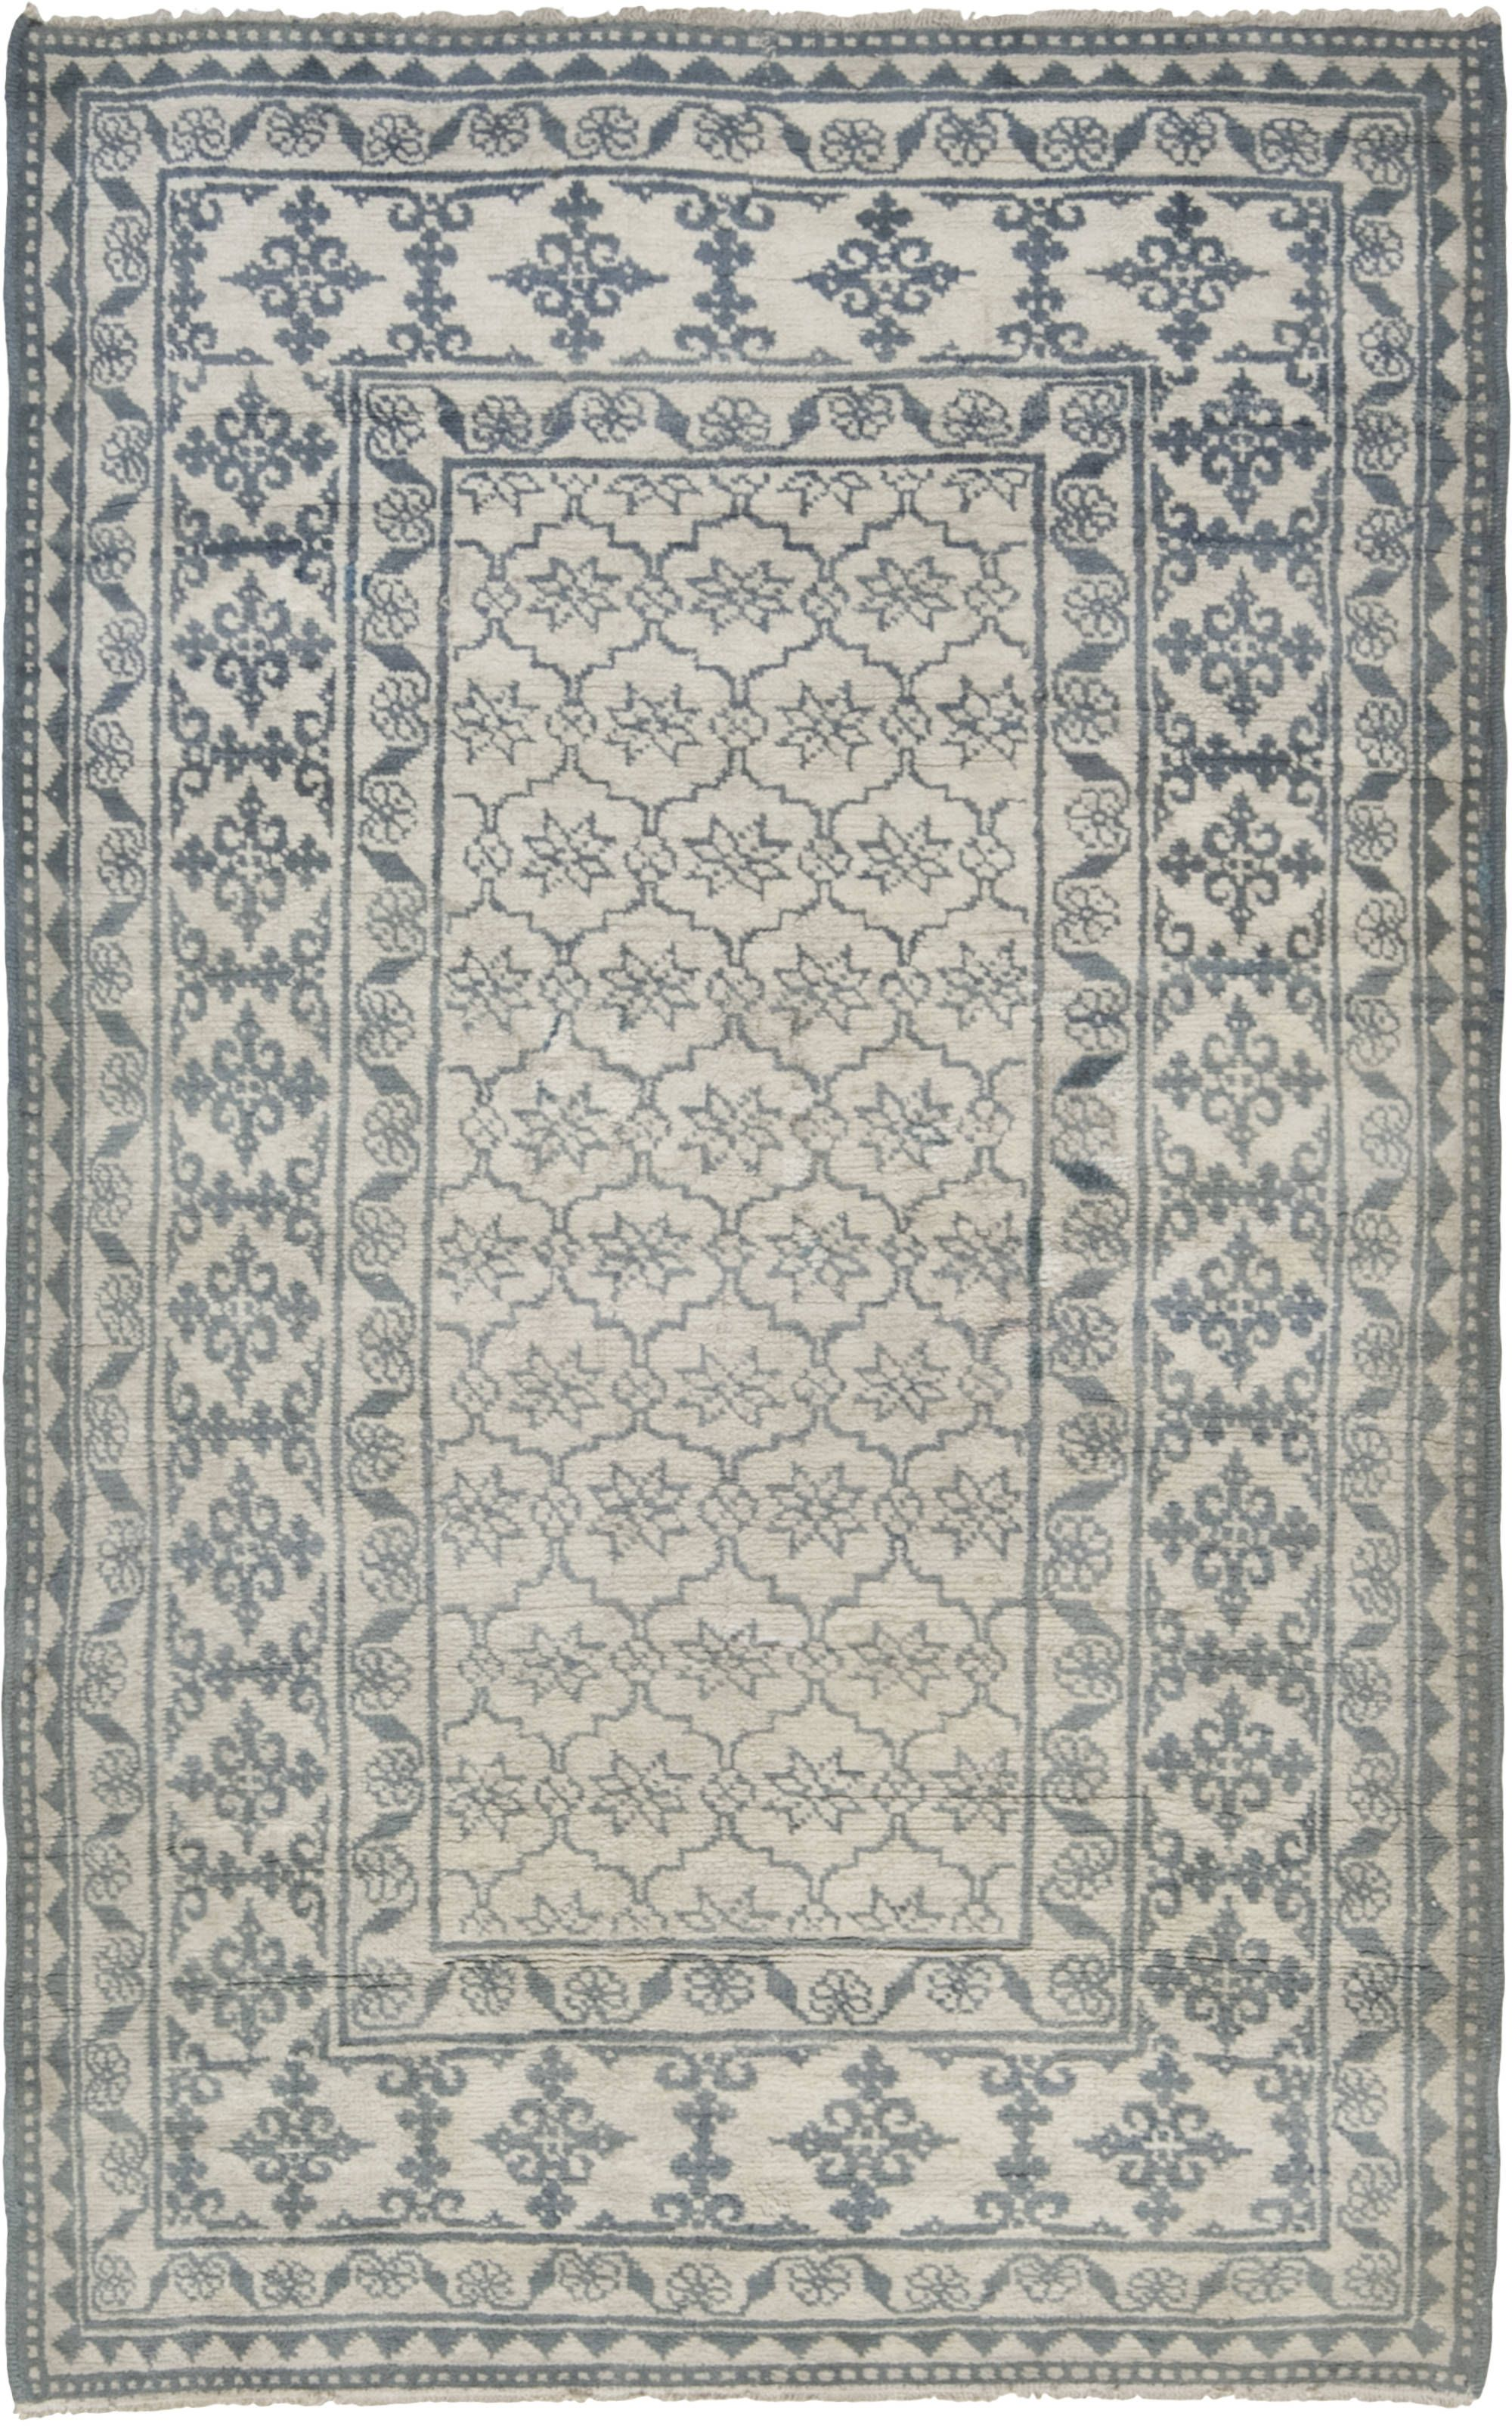 Antique Indian Cotton Agra Rug Carpet Handmade Agra Rug Patterned Carpet